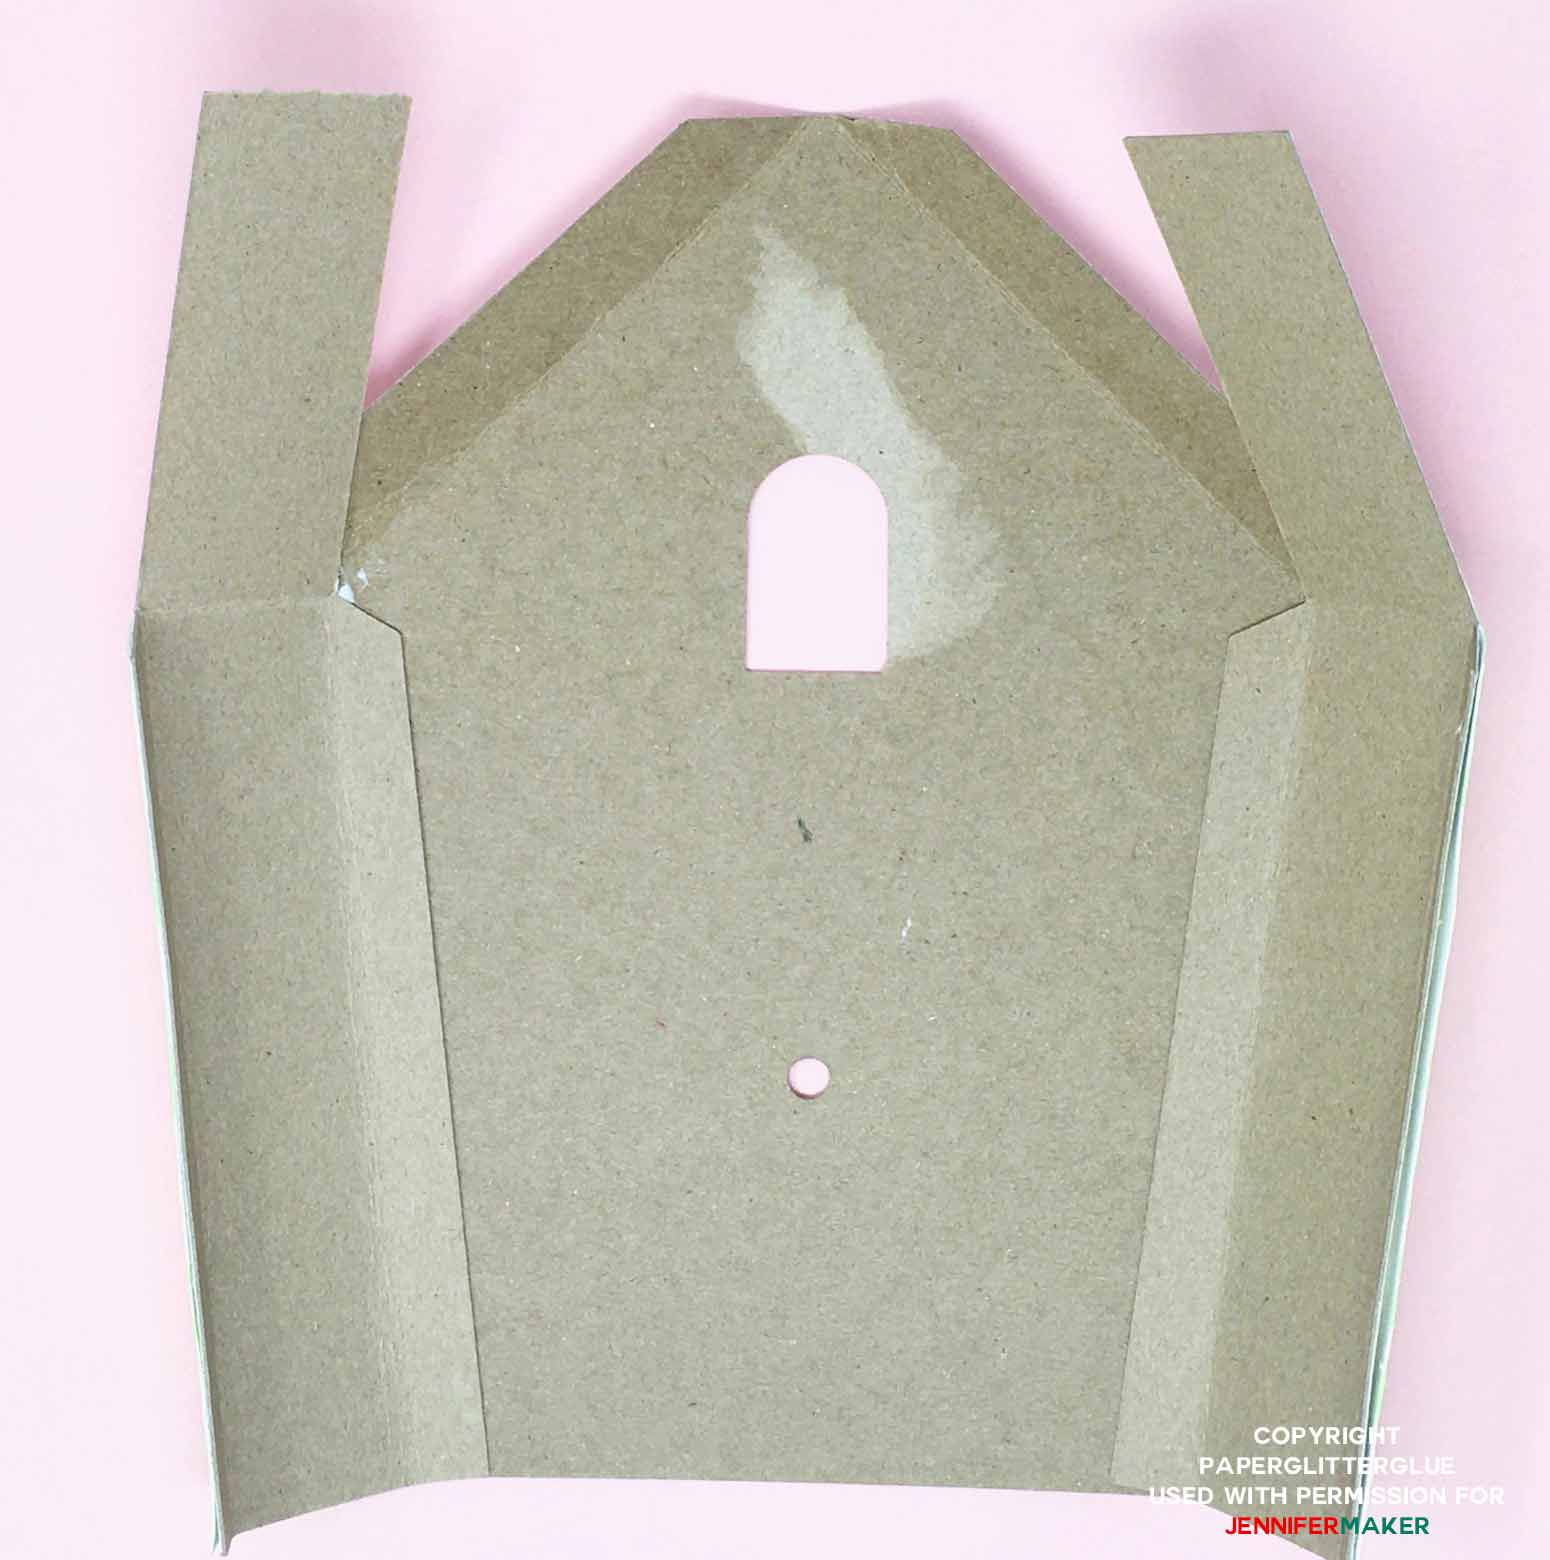 Cardboard side pieces glued to back piece of DIY cuckoo clock